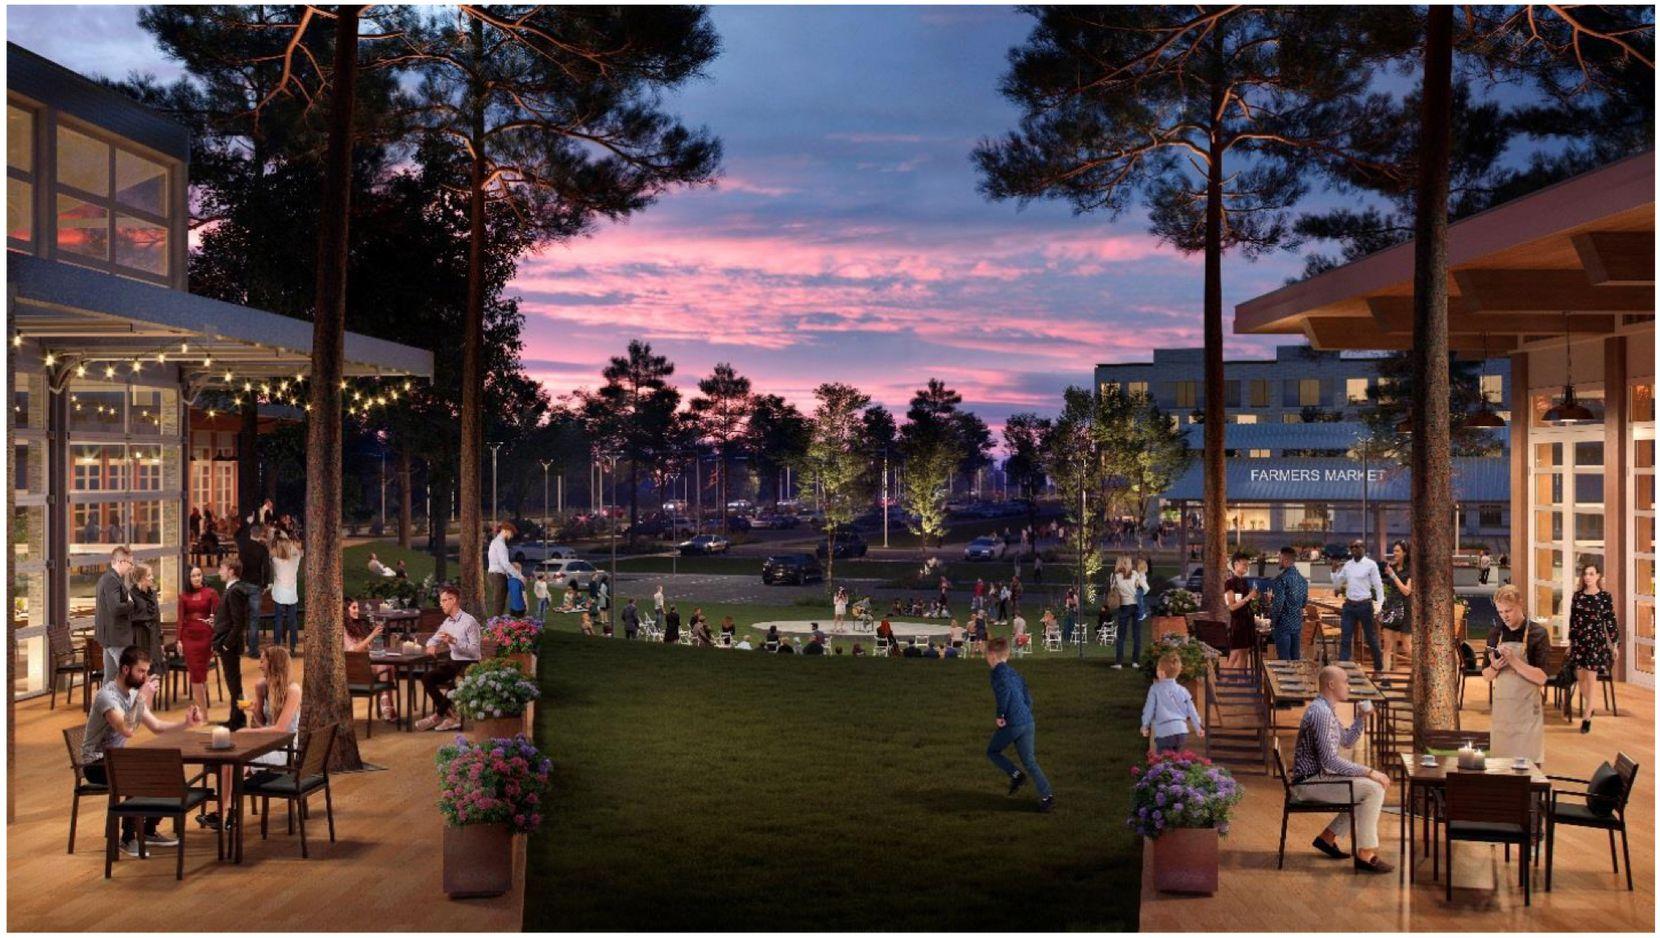 The planned development includes a live music venue.